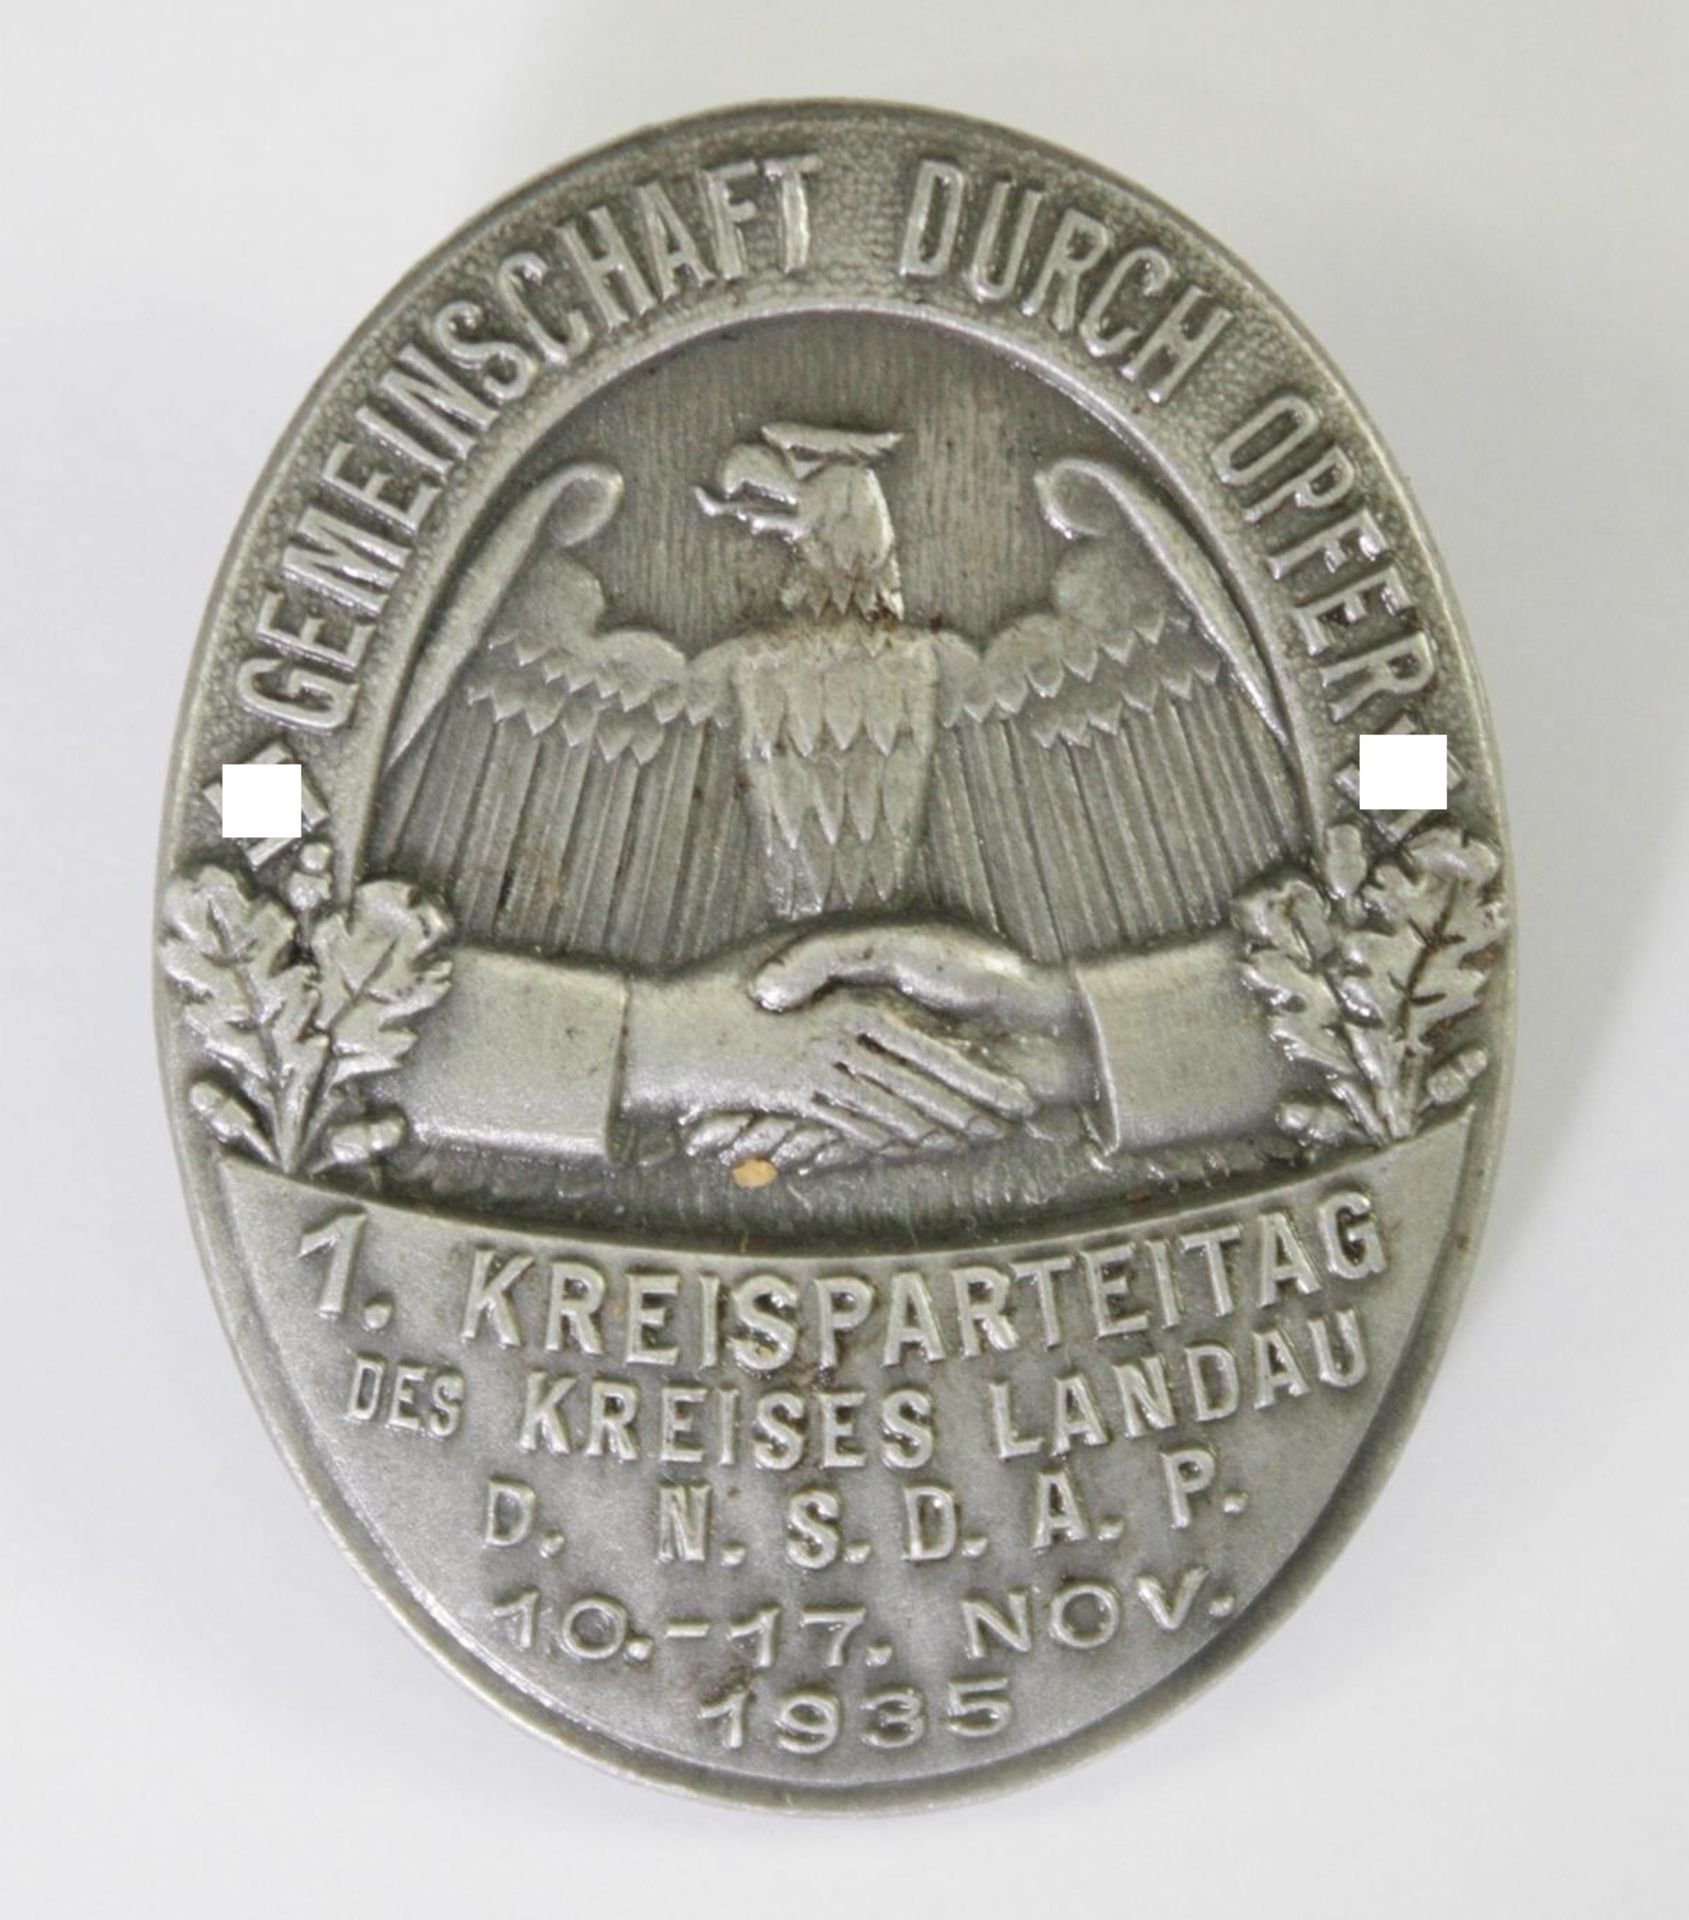 Abzeichen, 1. Kreisparteitag des Kreises Landau d. NSDAP 1935